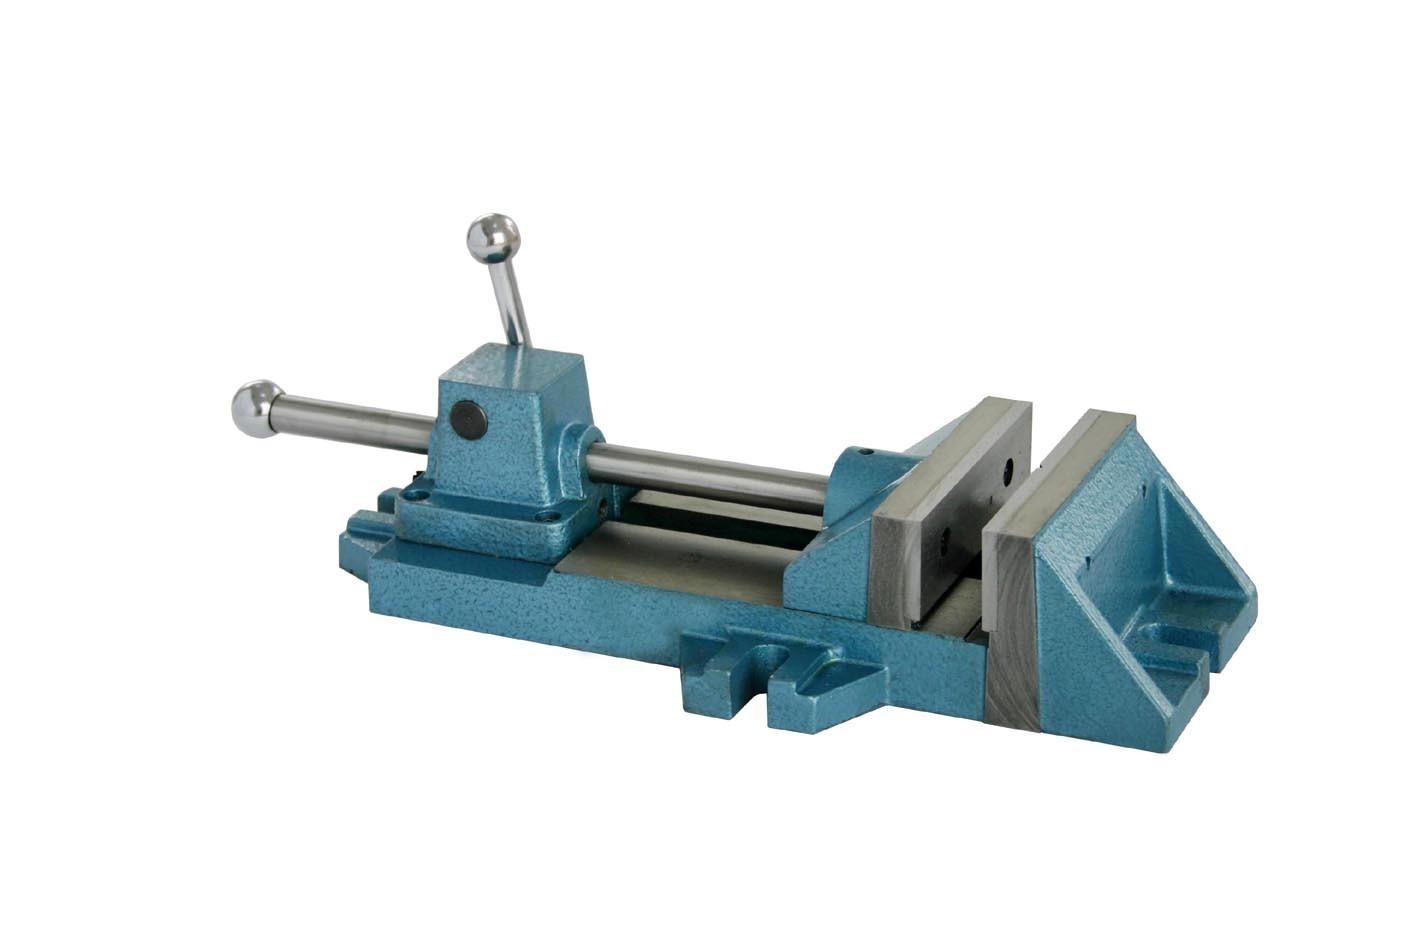 drilling machine tools